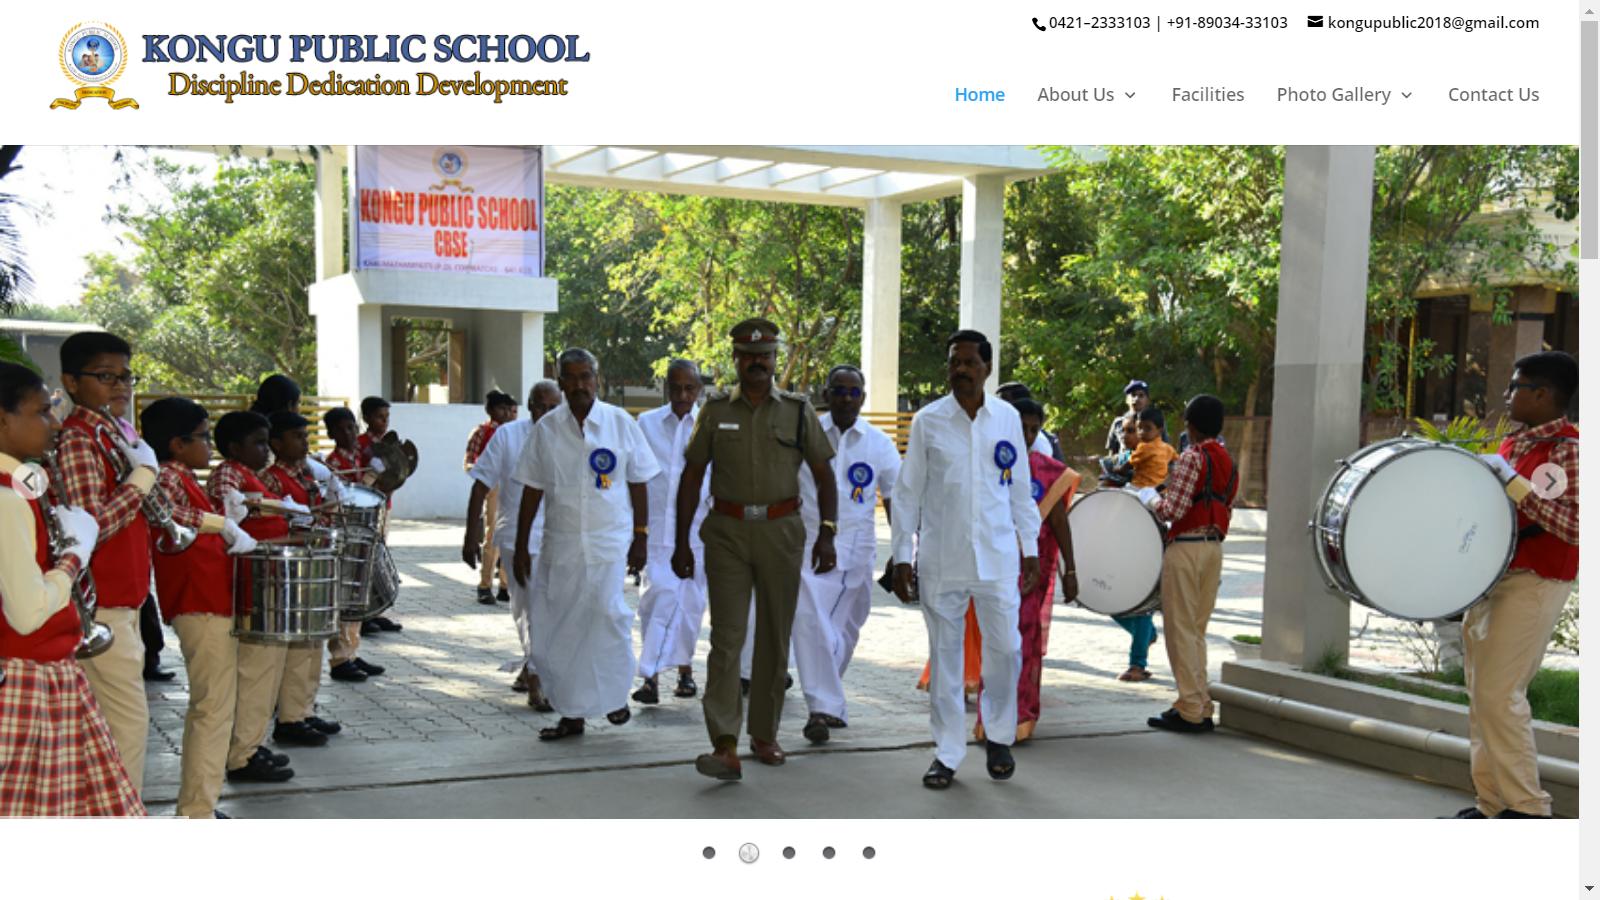 kongu public school